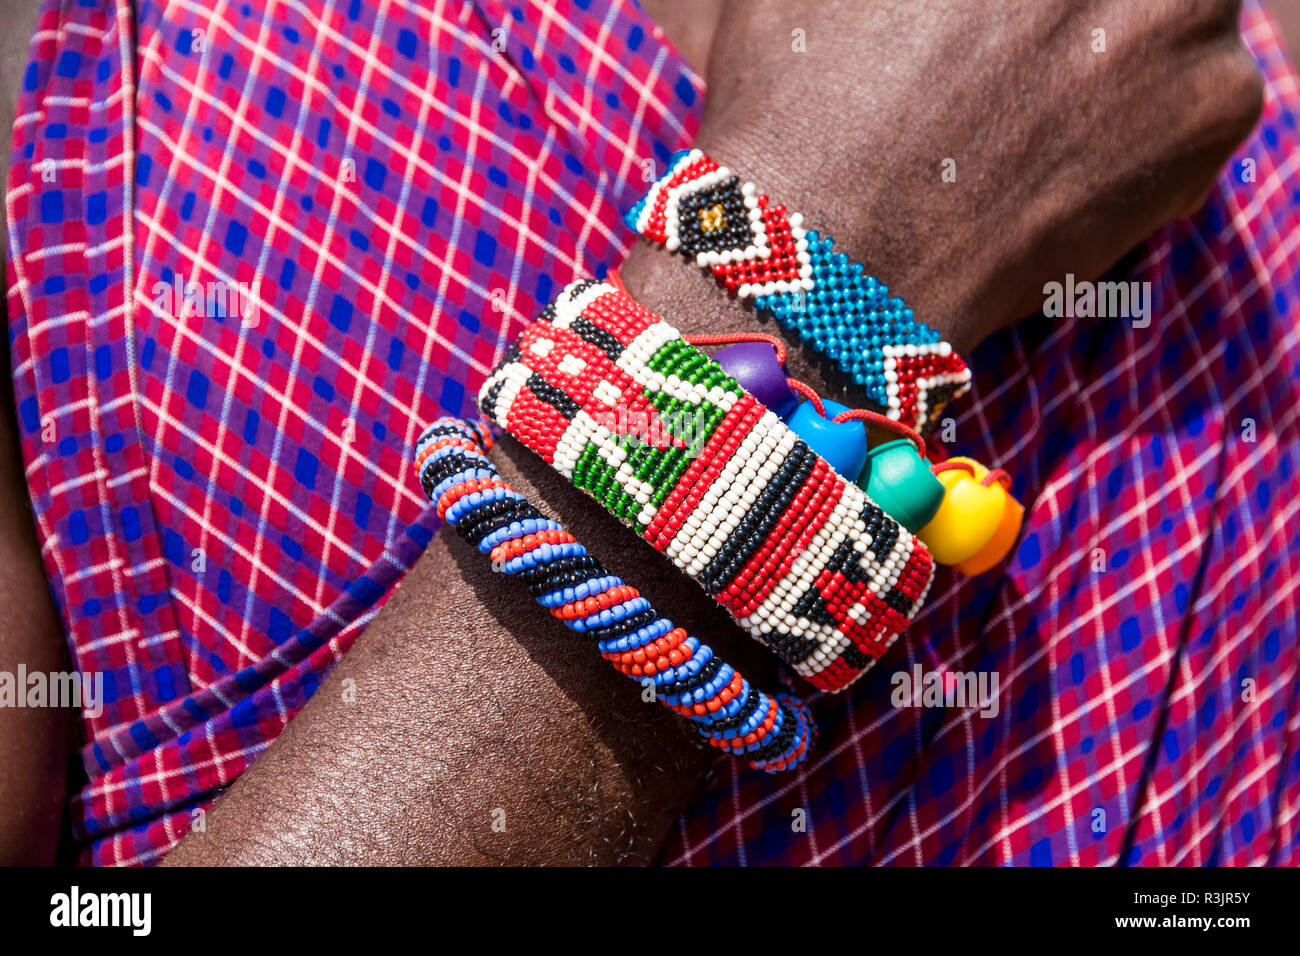 Africa, Kenya, Masai Mara National Reserve, Mara Ashnil region. Masai tribal jewelry and ornamentation. - Stock Image